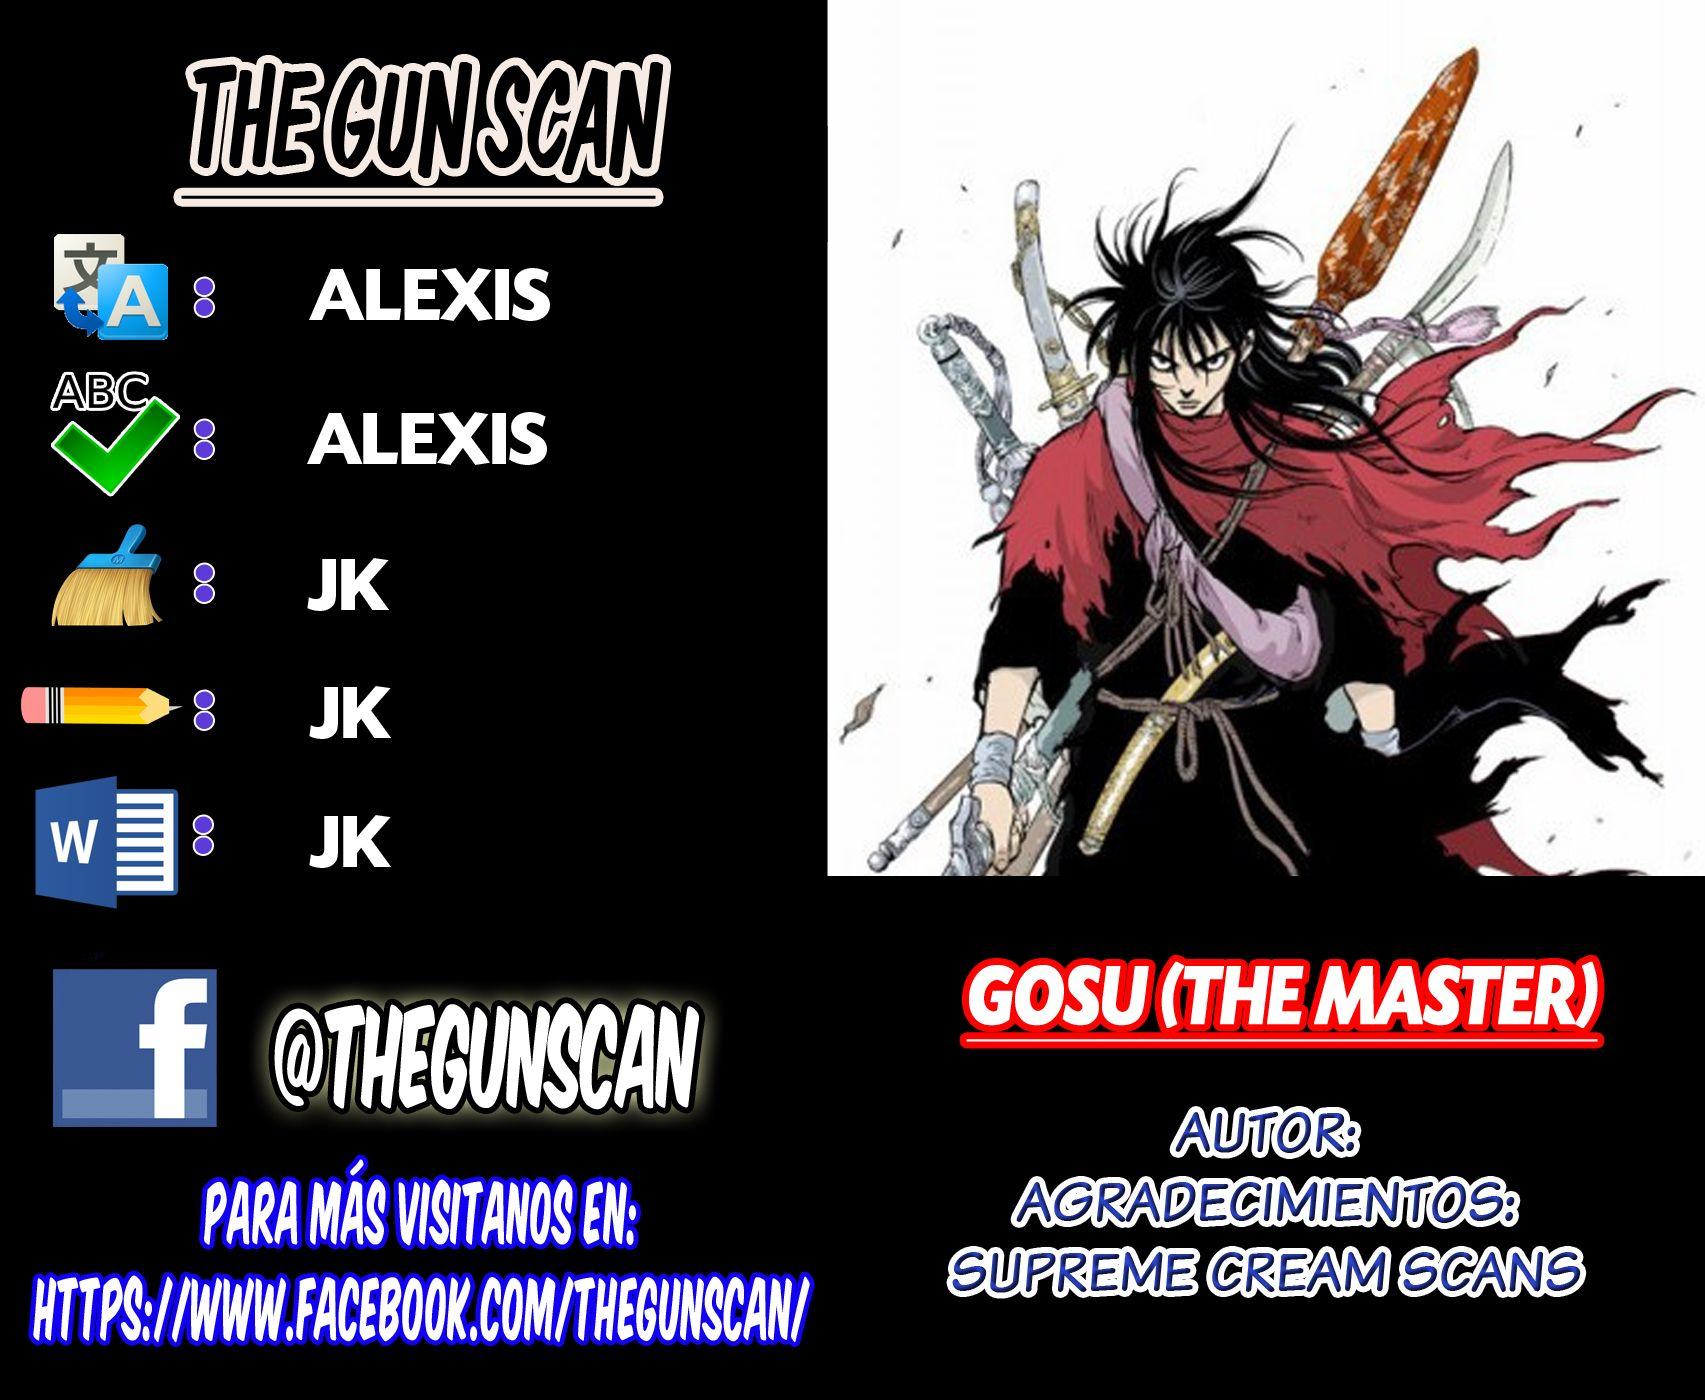 https://c5.ninemanga.com/es_manga/pic2/9/18249/489207/682d409f010b6adafa853f2111b6d49a.jpg Page 1